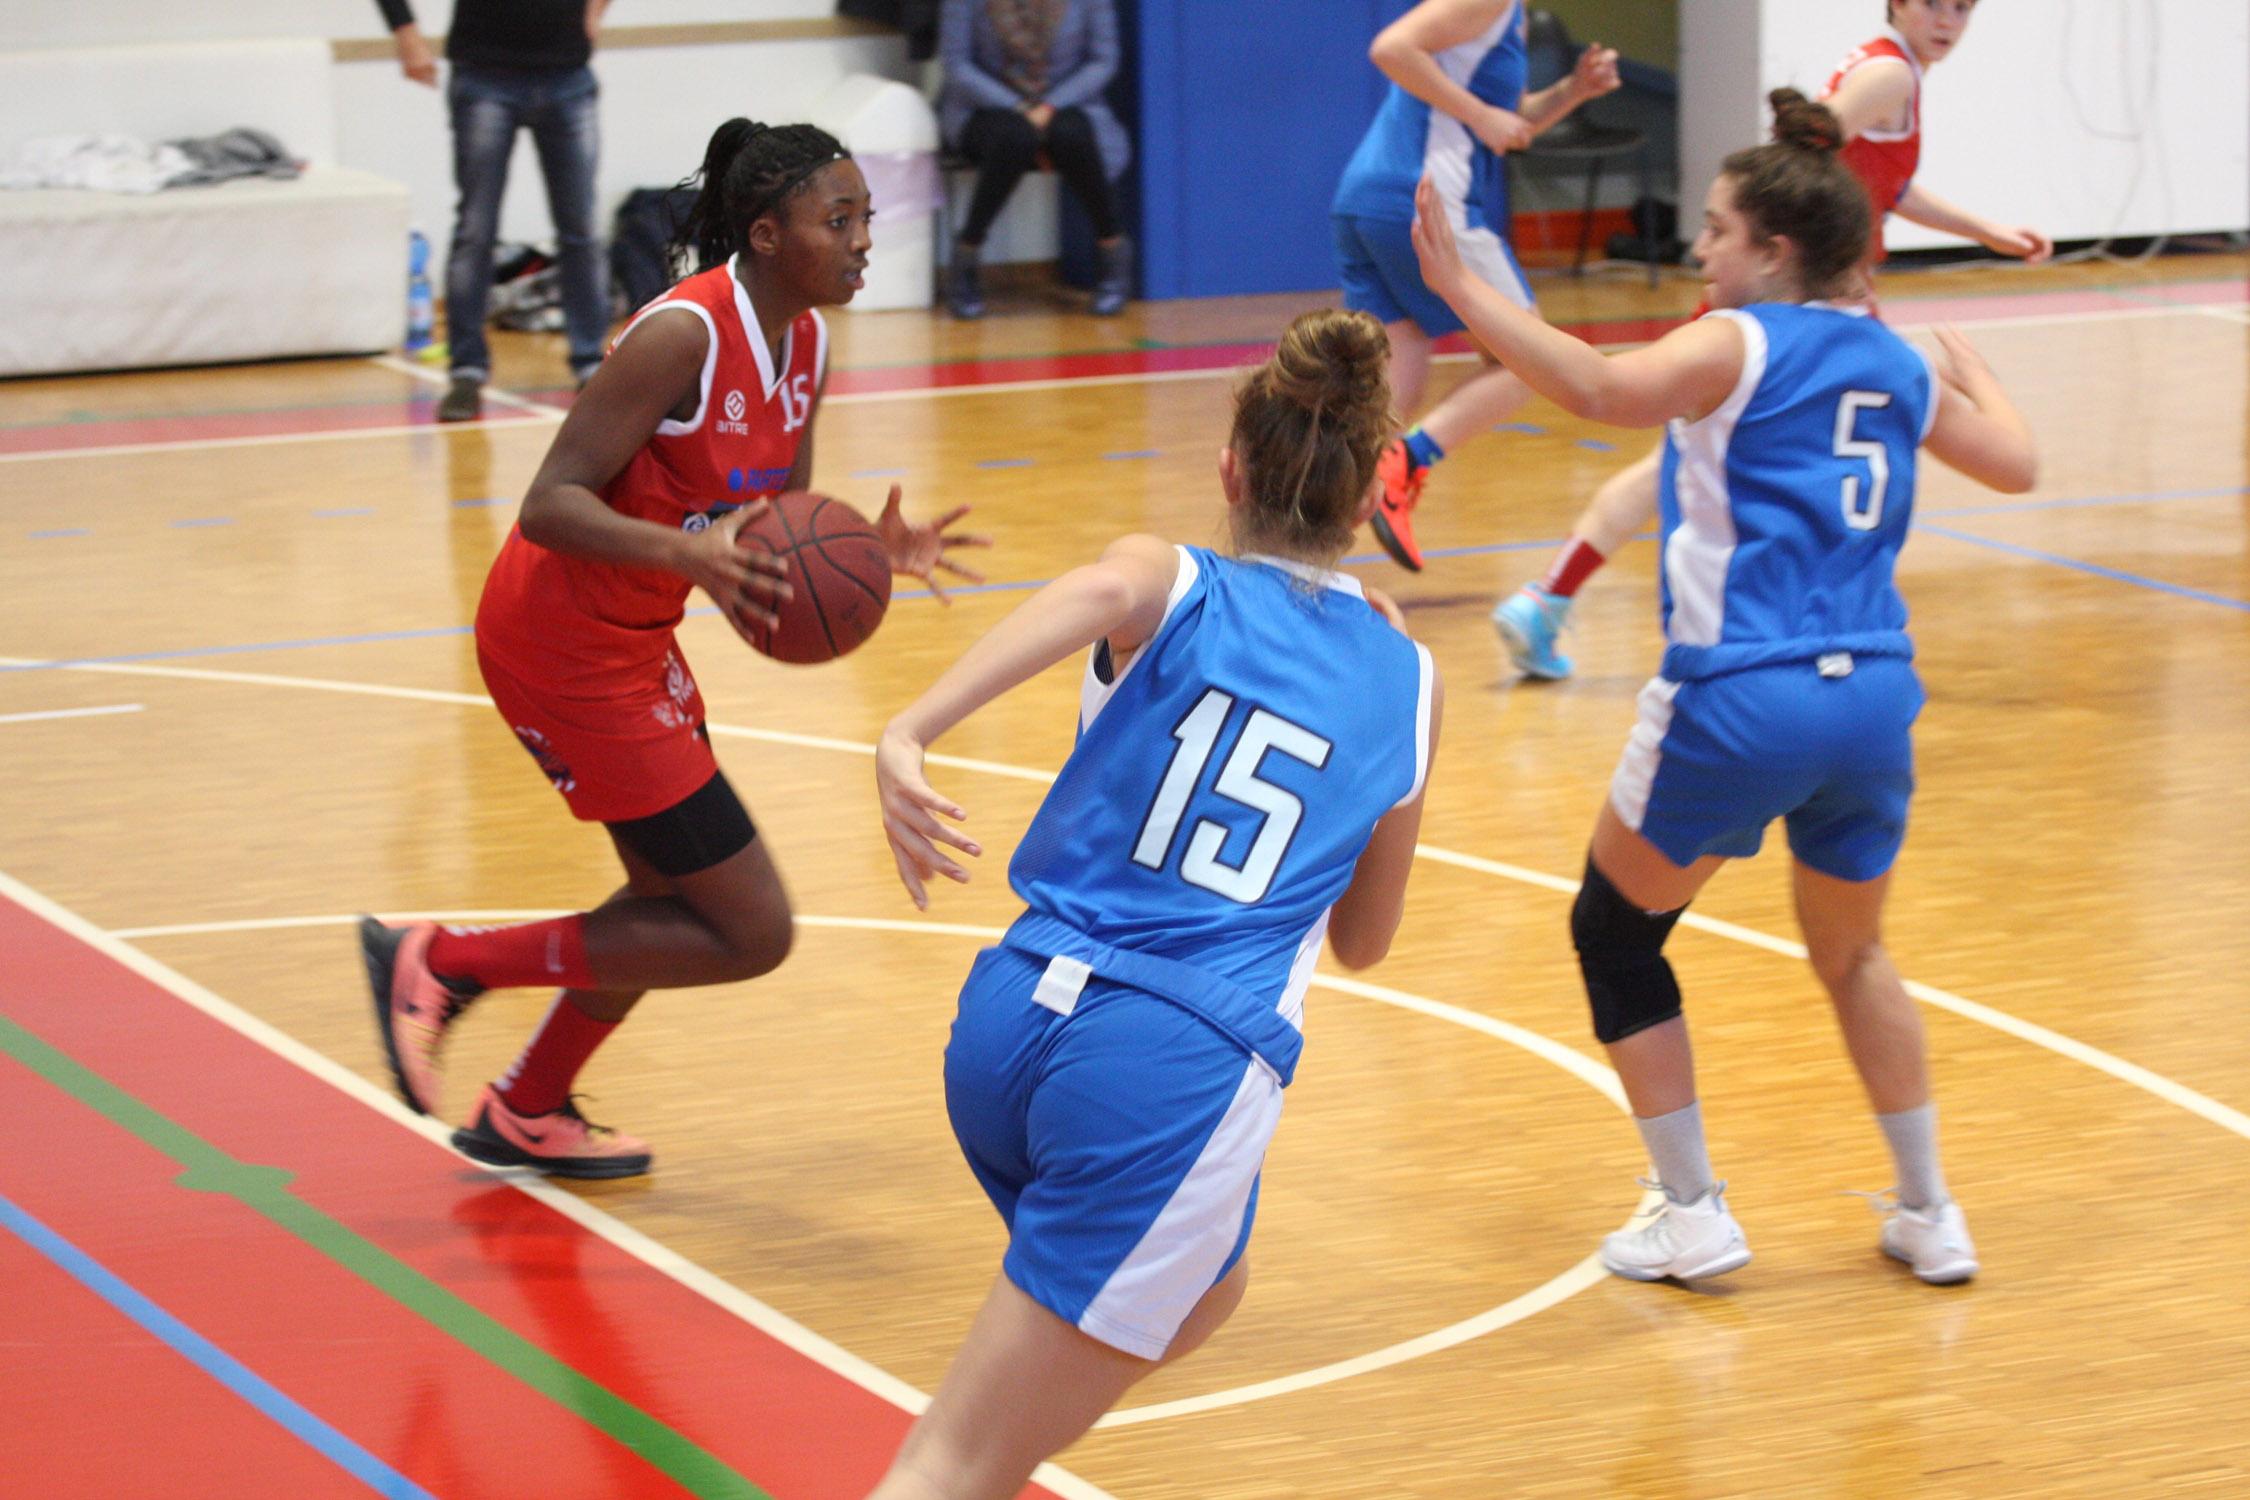 U16E - Costa Masnaga vs Baskettiamo Vittuone 2001 00015.jpg